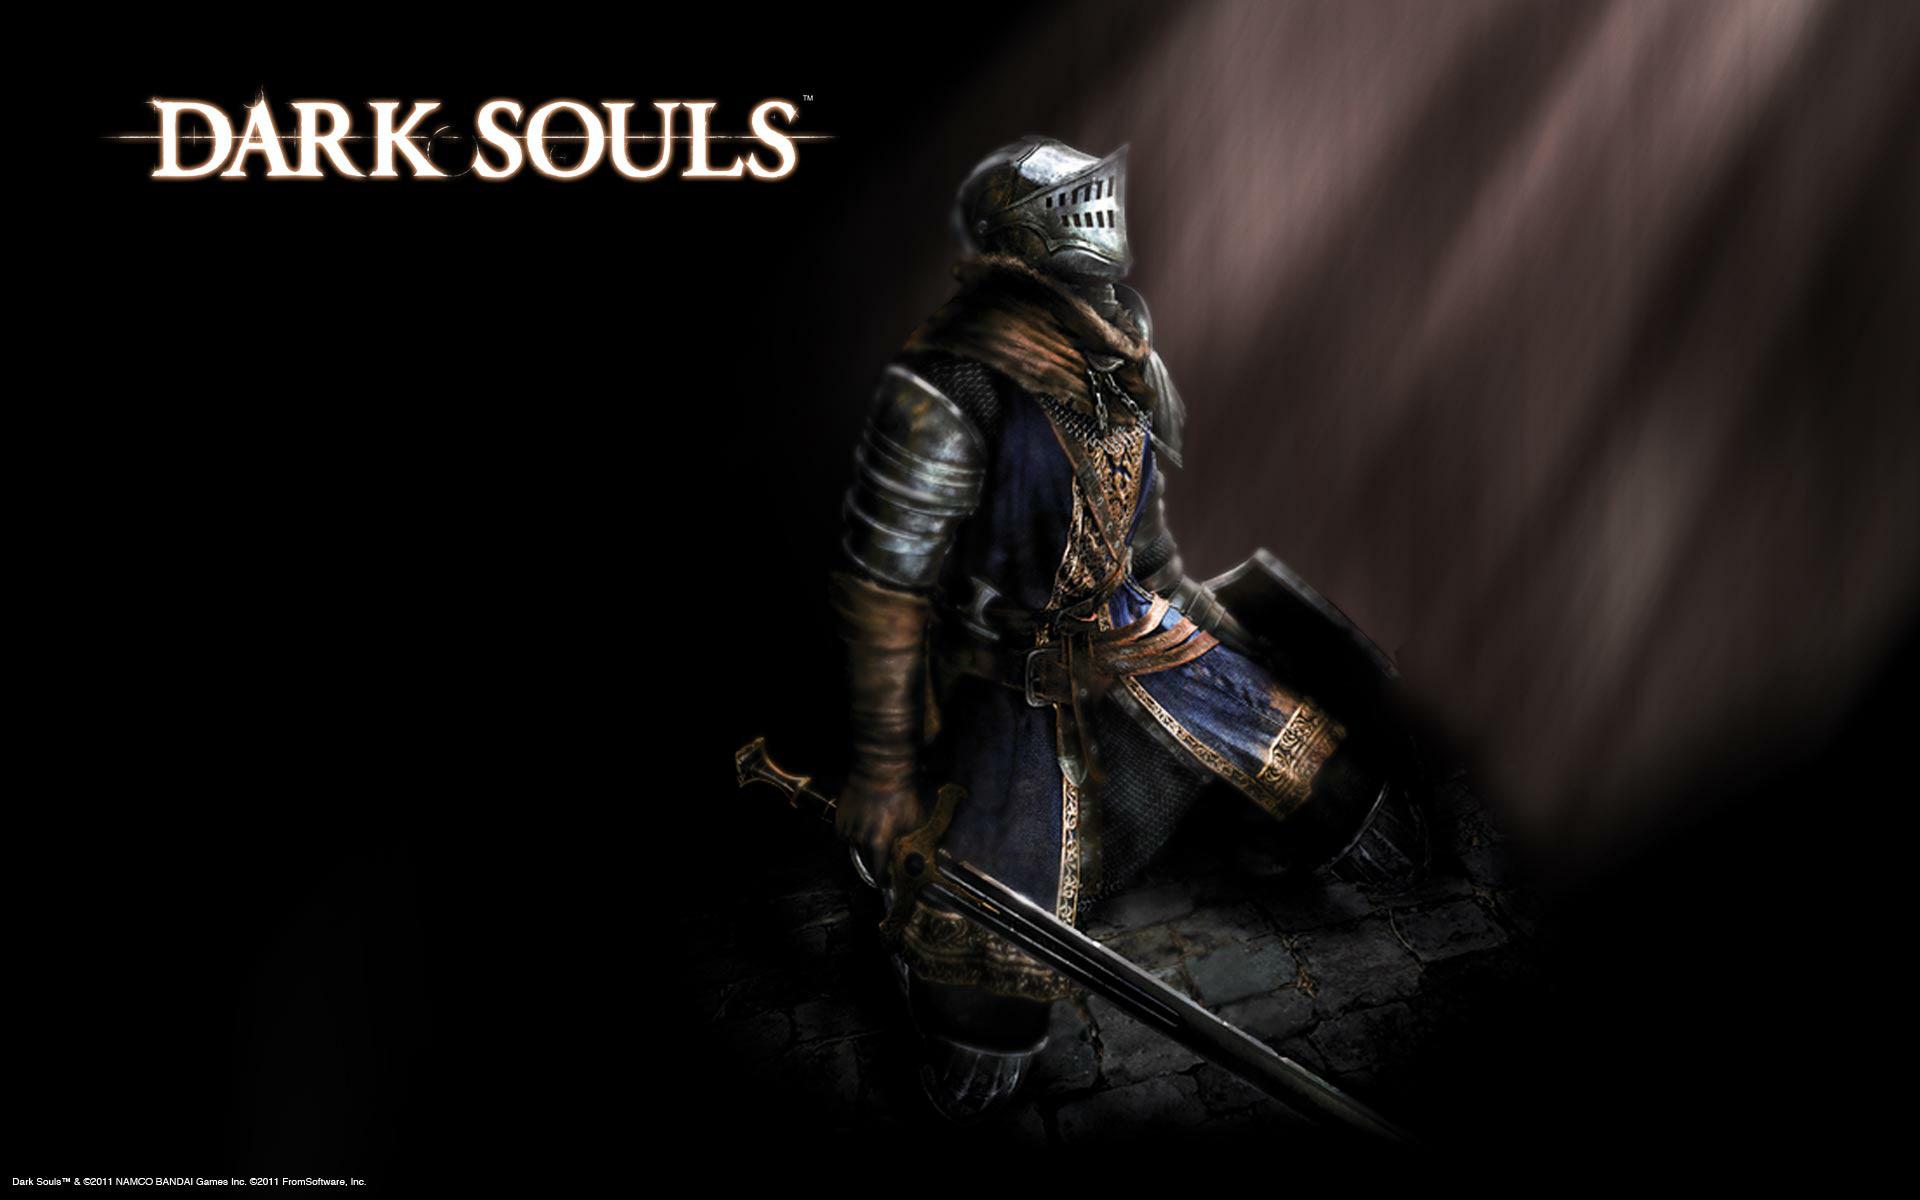 Dark souls prepare to die edition как снять проклятие - b6891